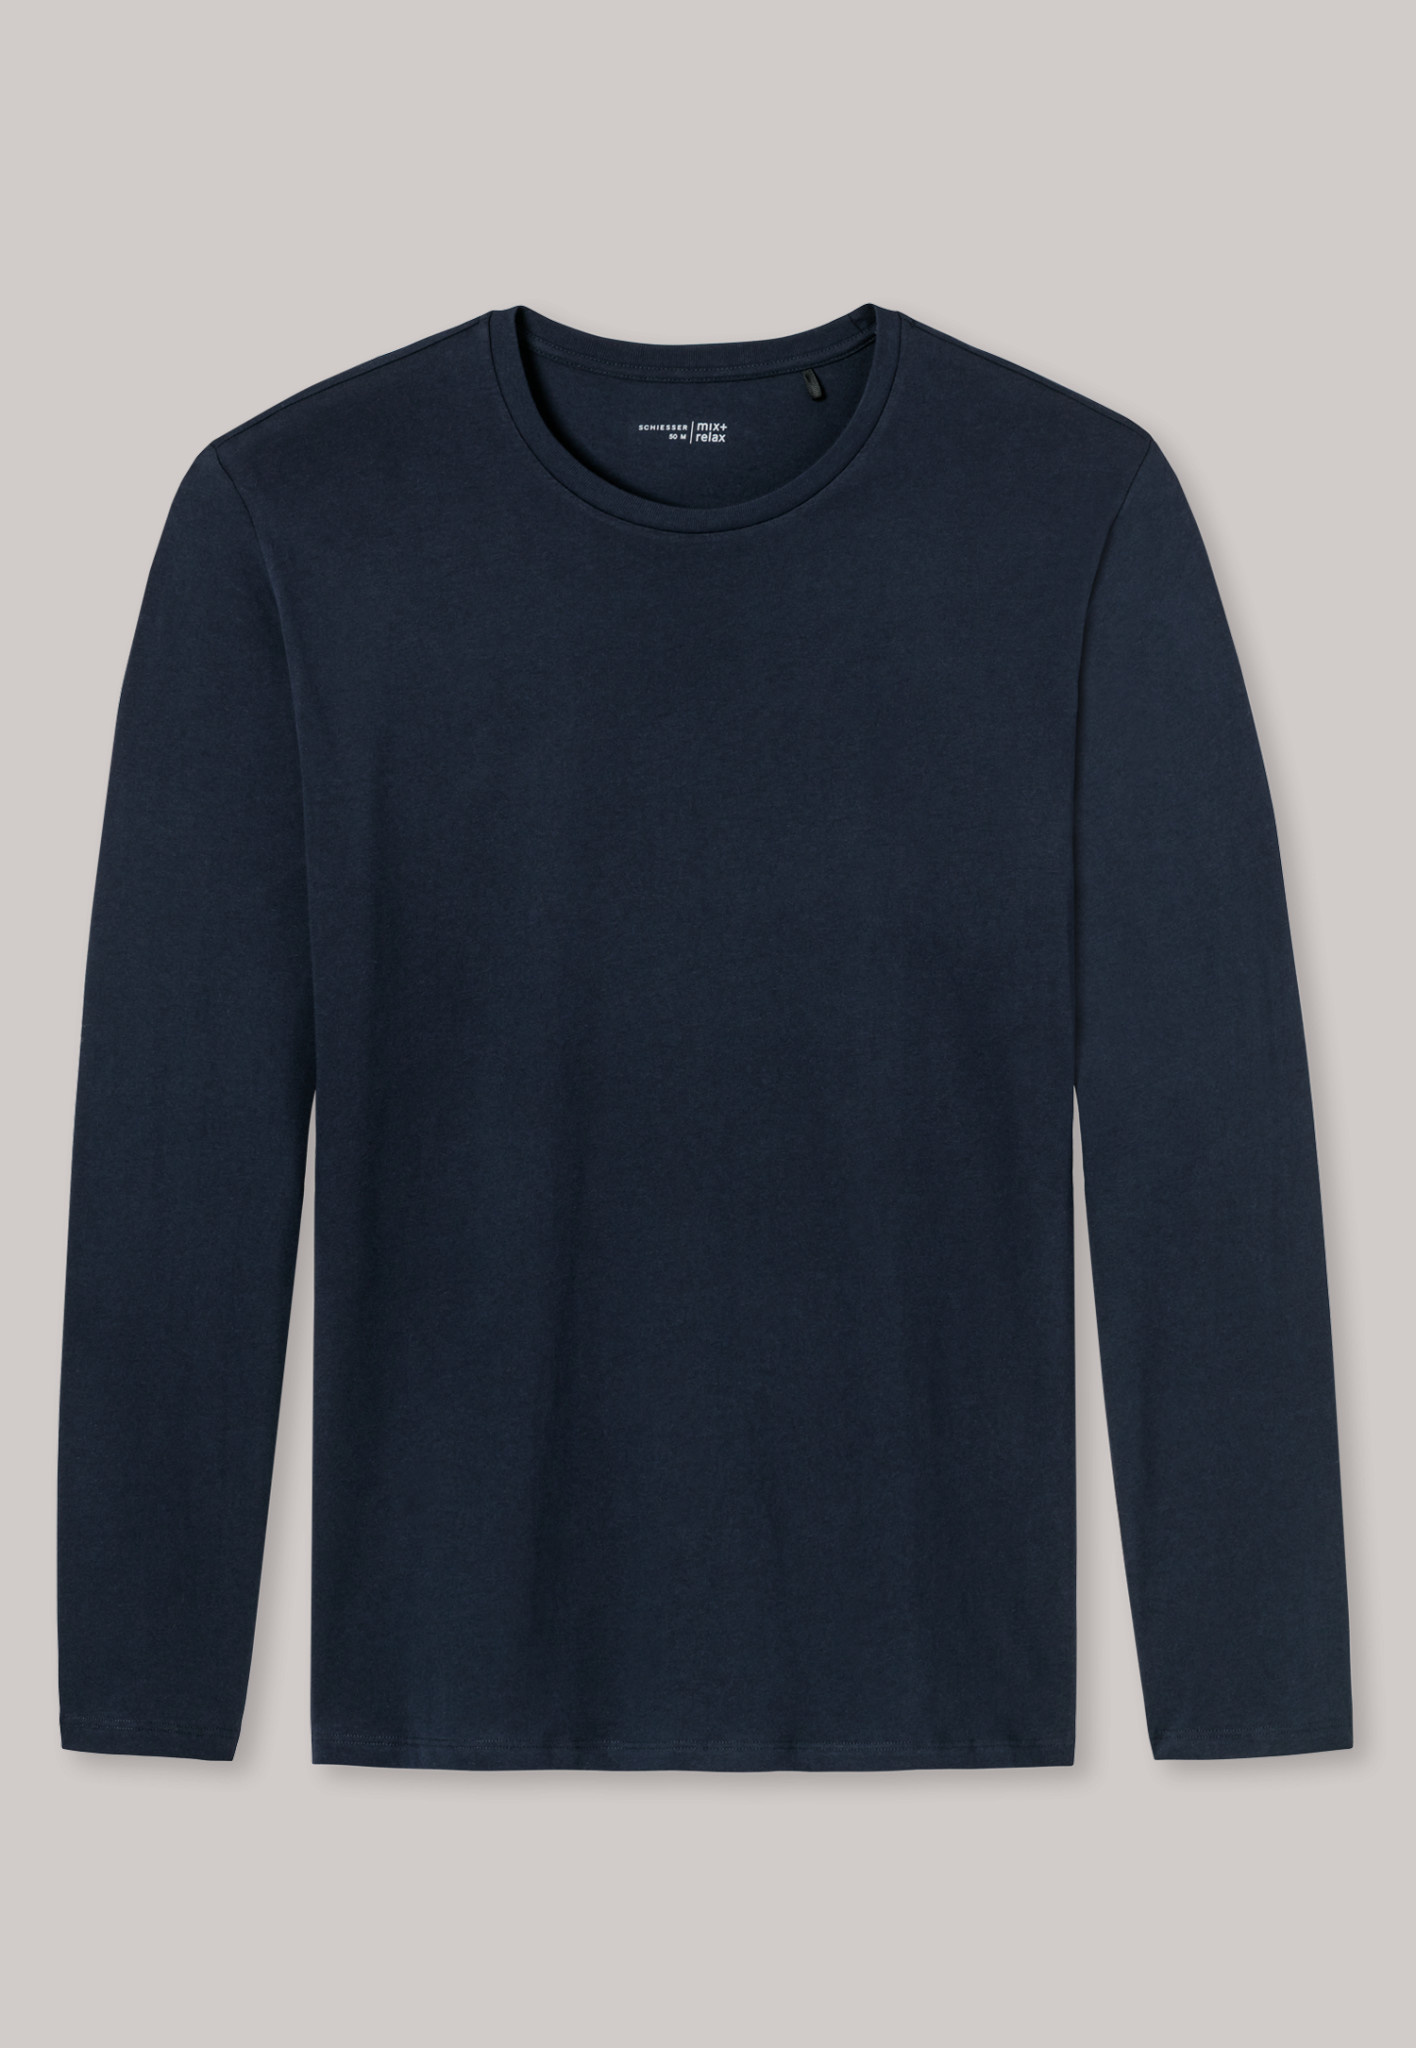 Shirt lange mouw Mix & Match 163835 - donkerblauw-3